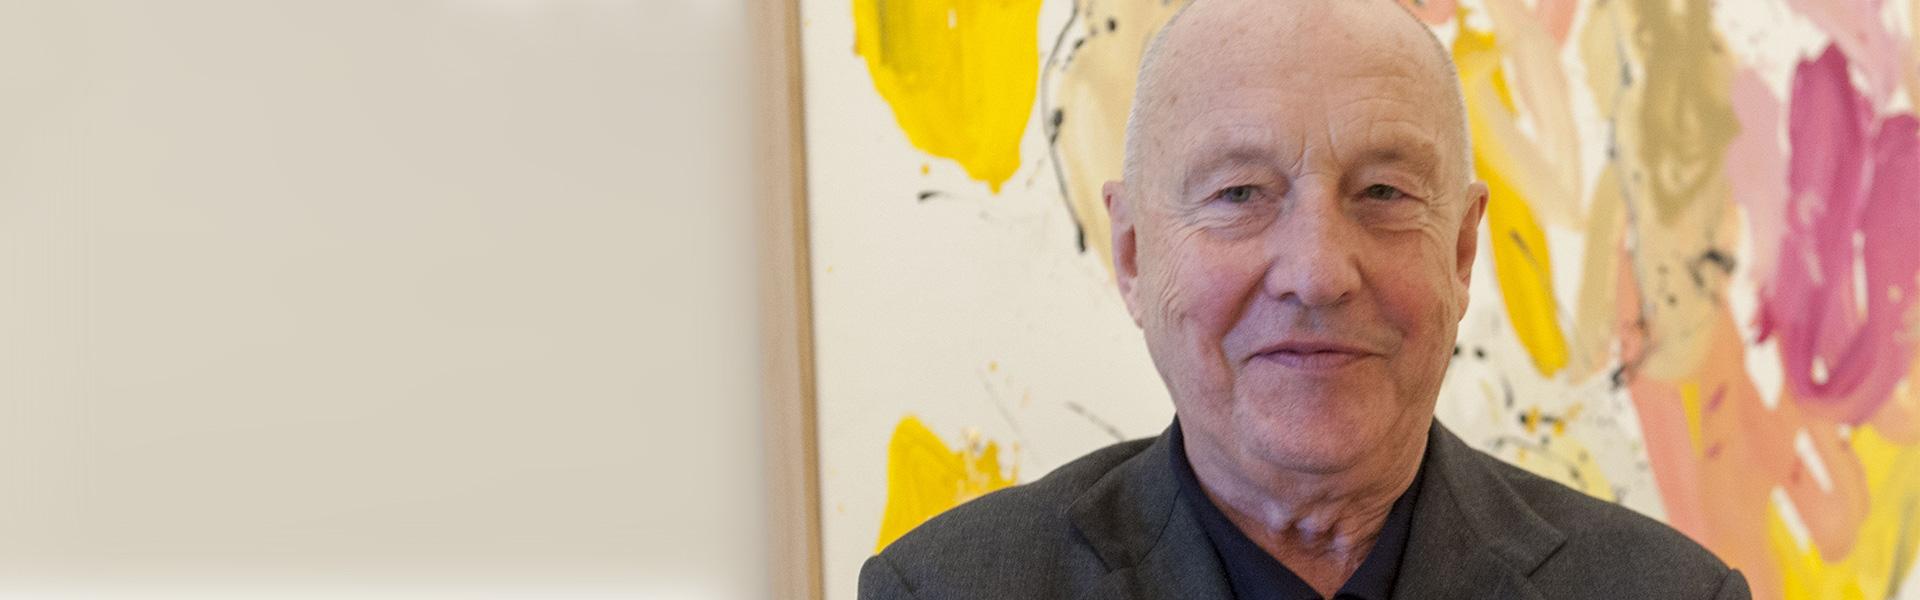 Georg Baselitz   Artistak   Guggenheim Bilbao Museoa